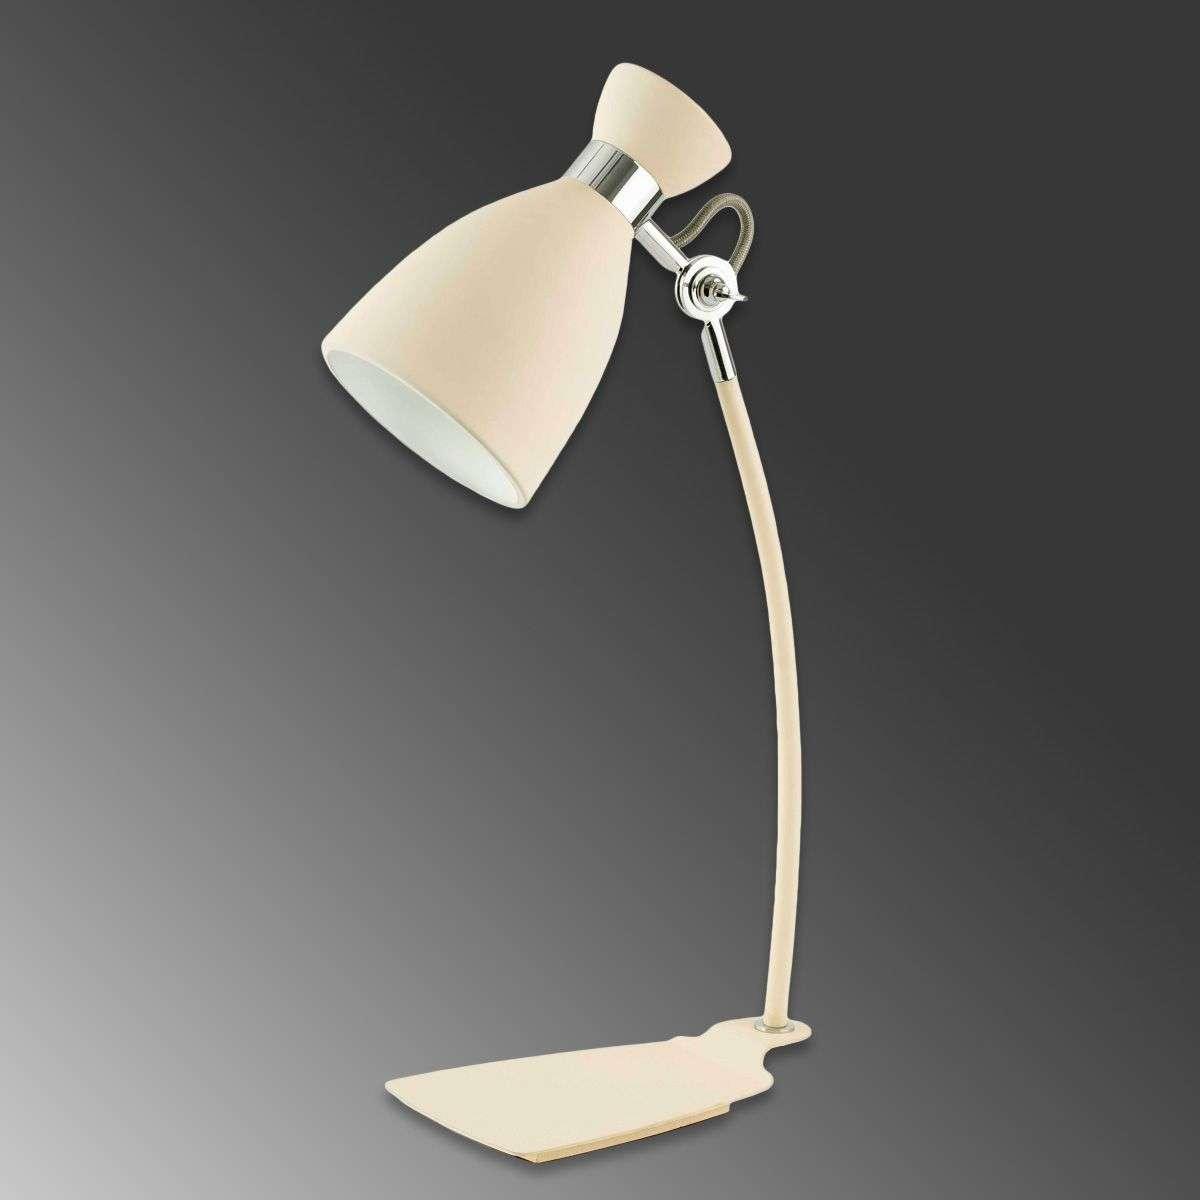 Decorative Retro Desk Lamp Beige 3507163 31